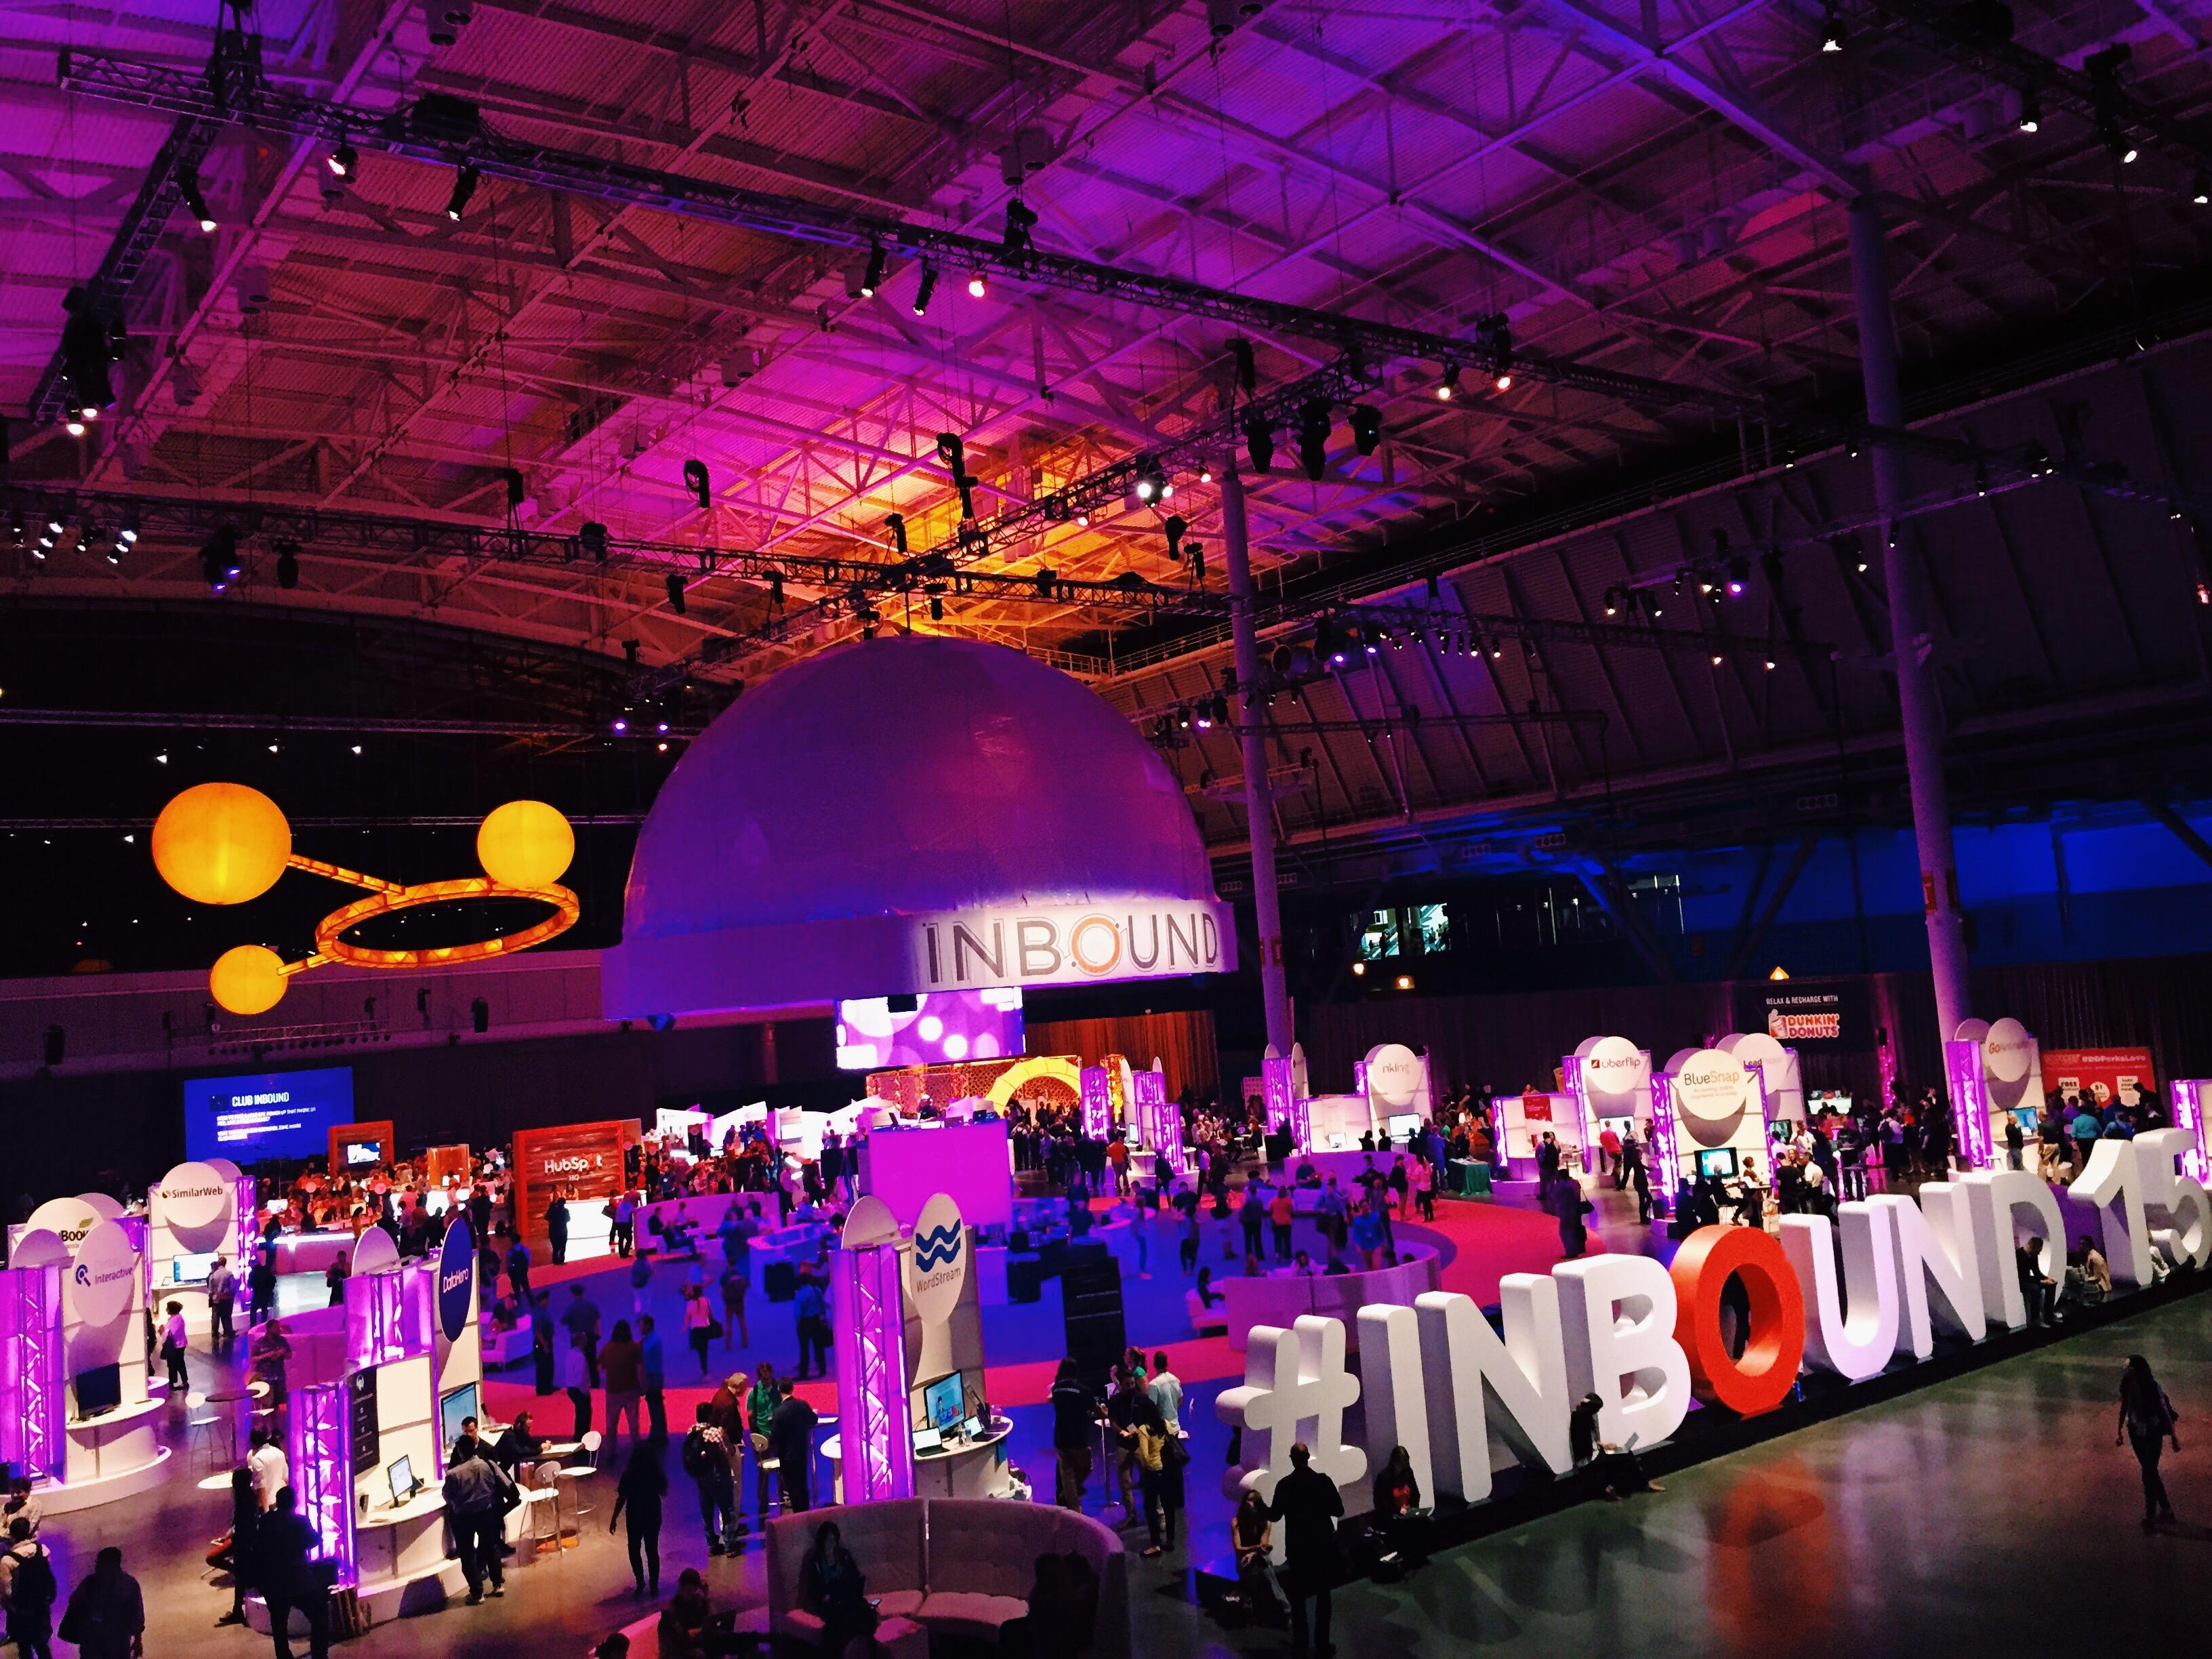 Hubspot Inbound Marketing Conference